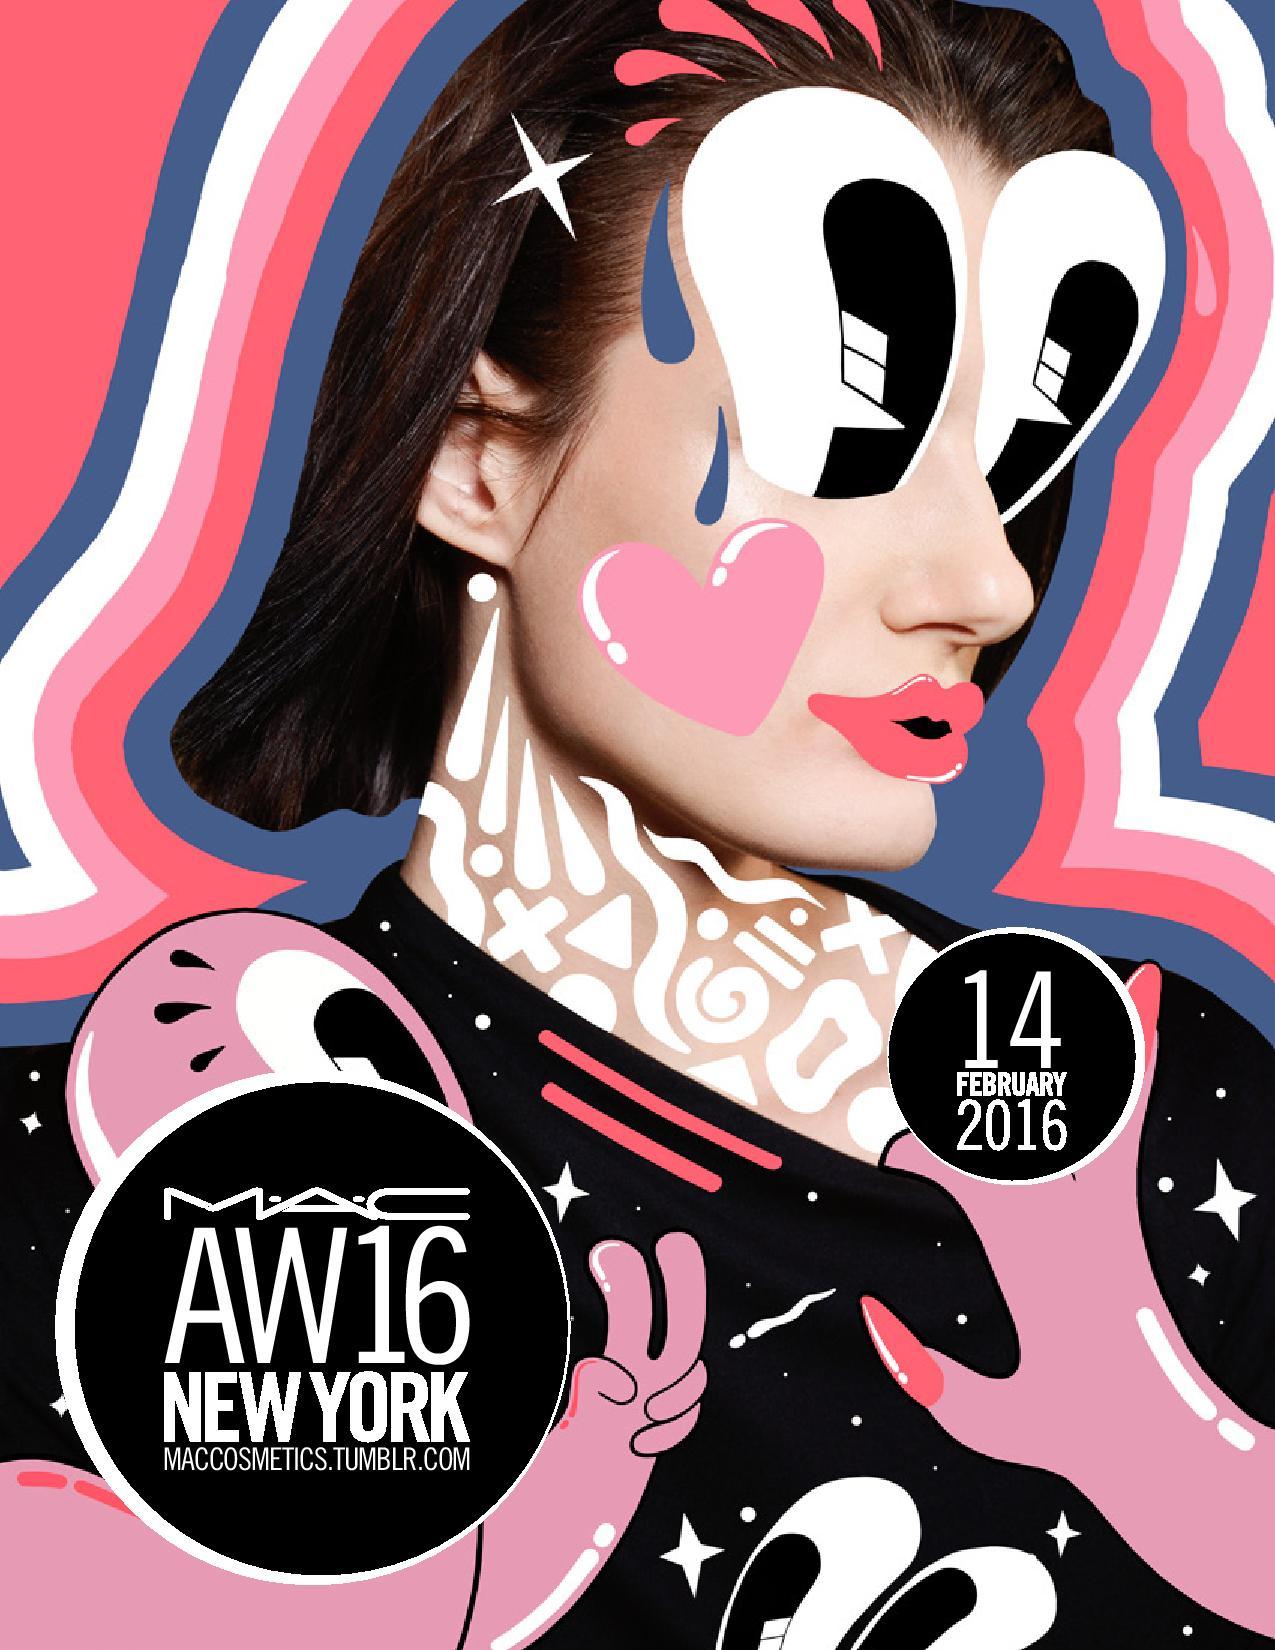 AW16_DAILY FACECHART_NEW YORK_FEB 14 HOOD BY AIR, PRABAL GURUNG)-page-001